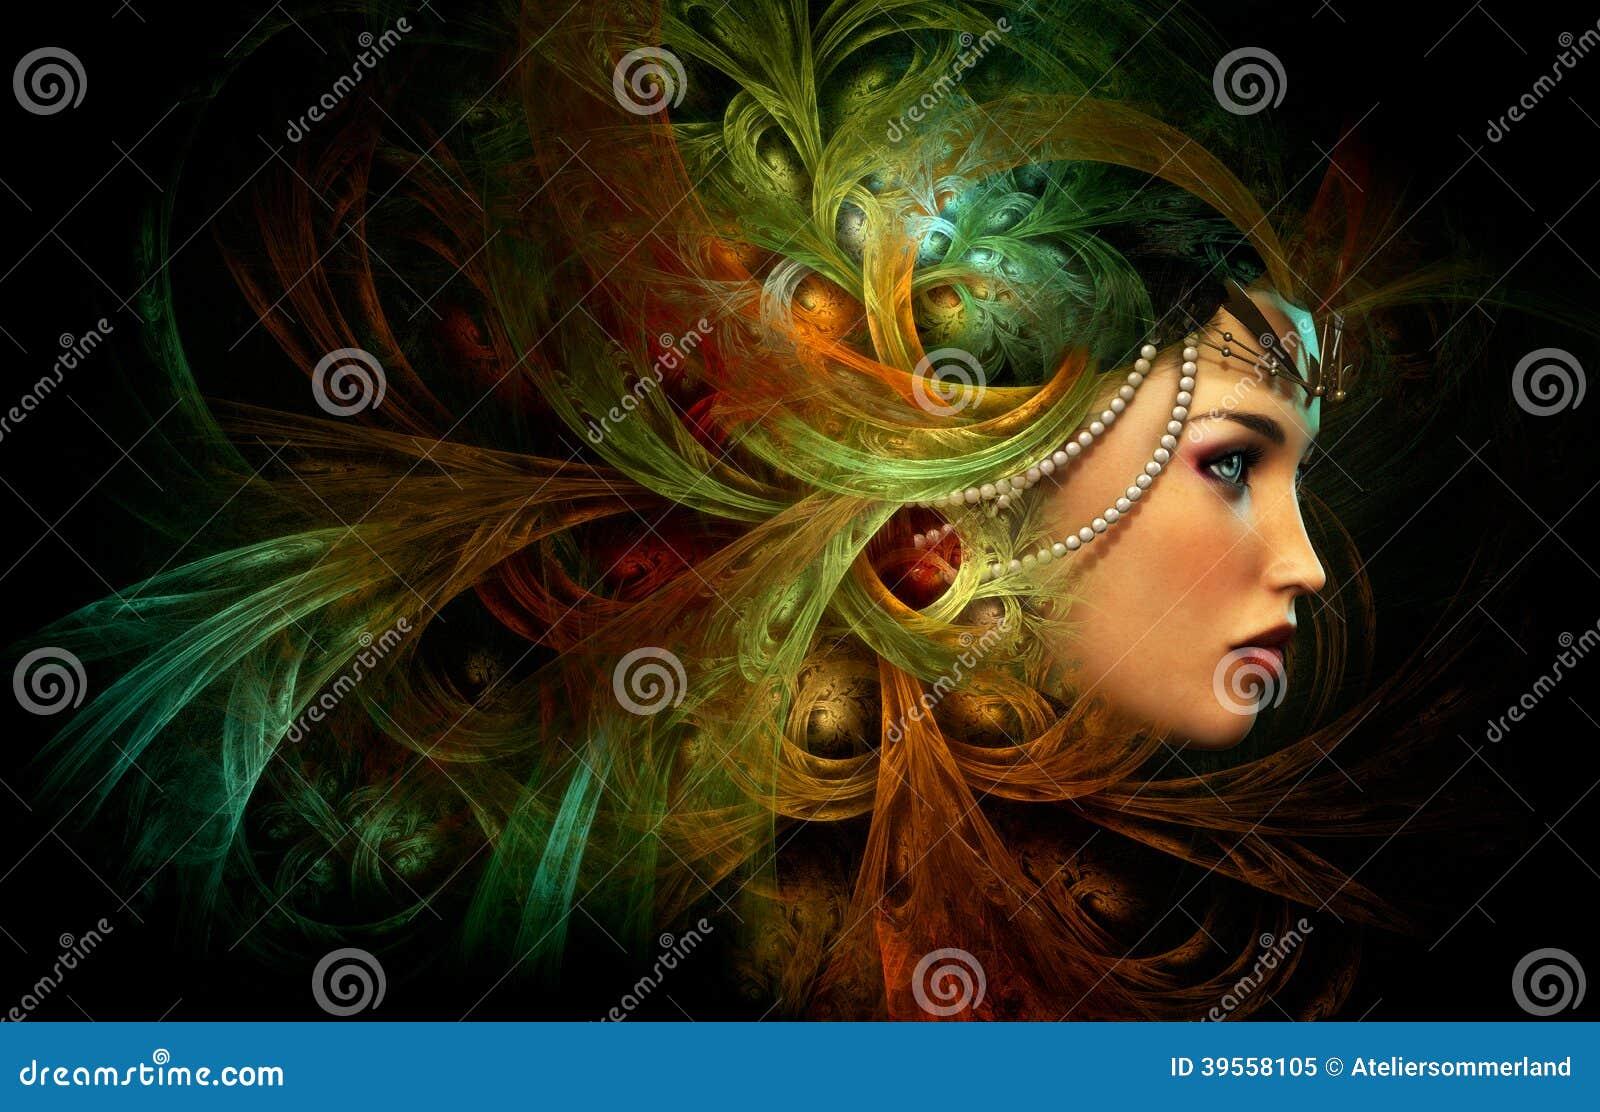 Lady with an elegant headdress, CG